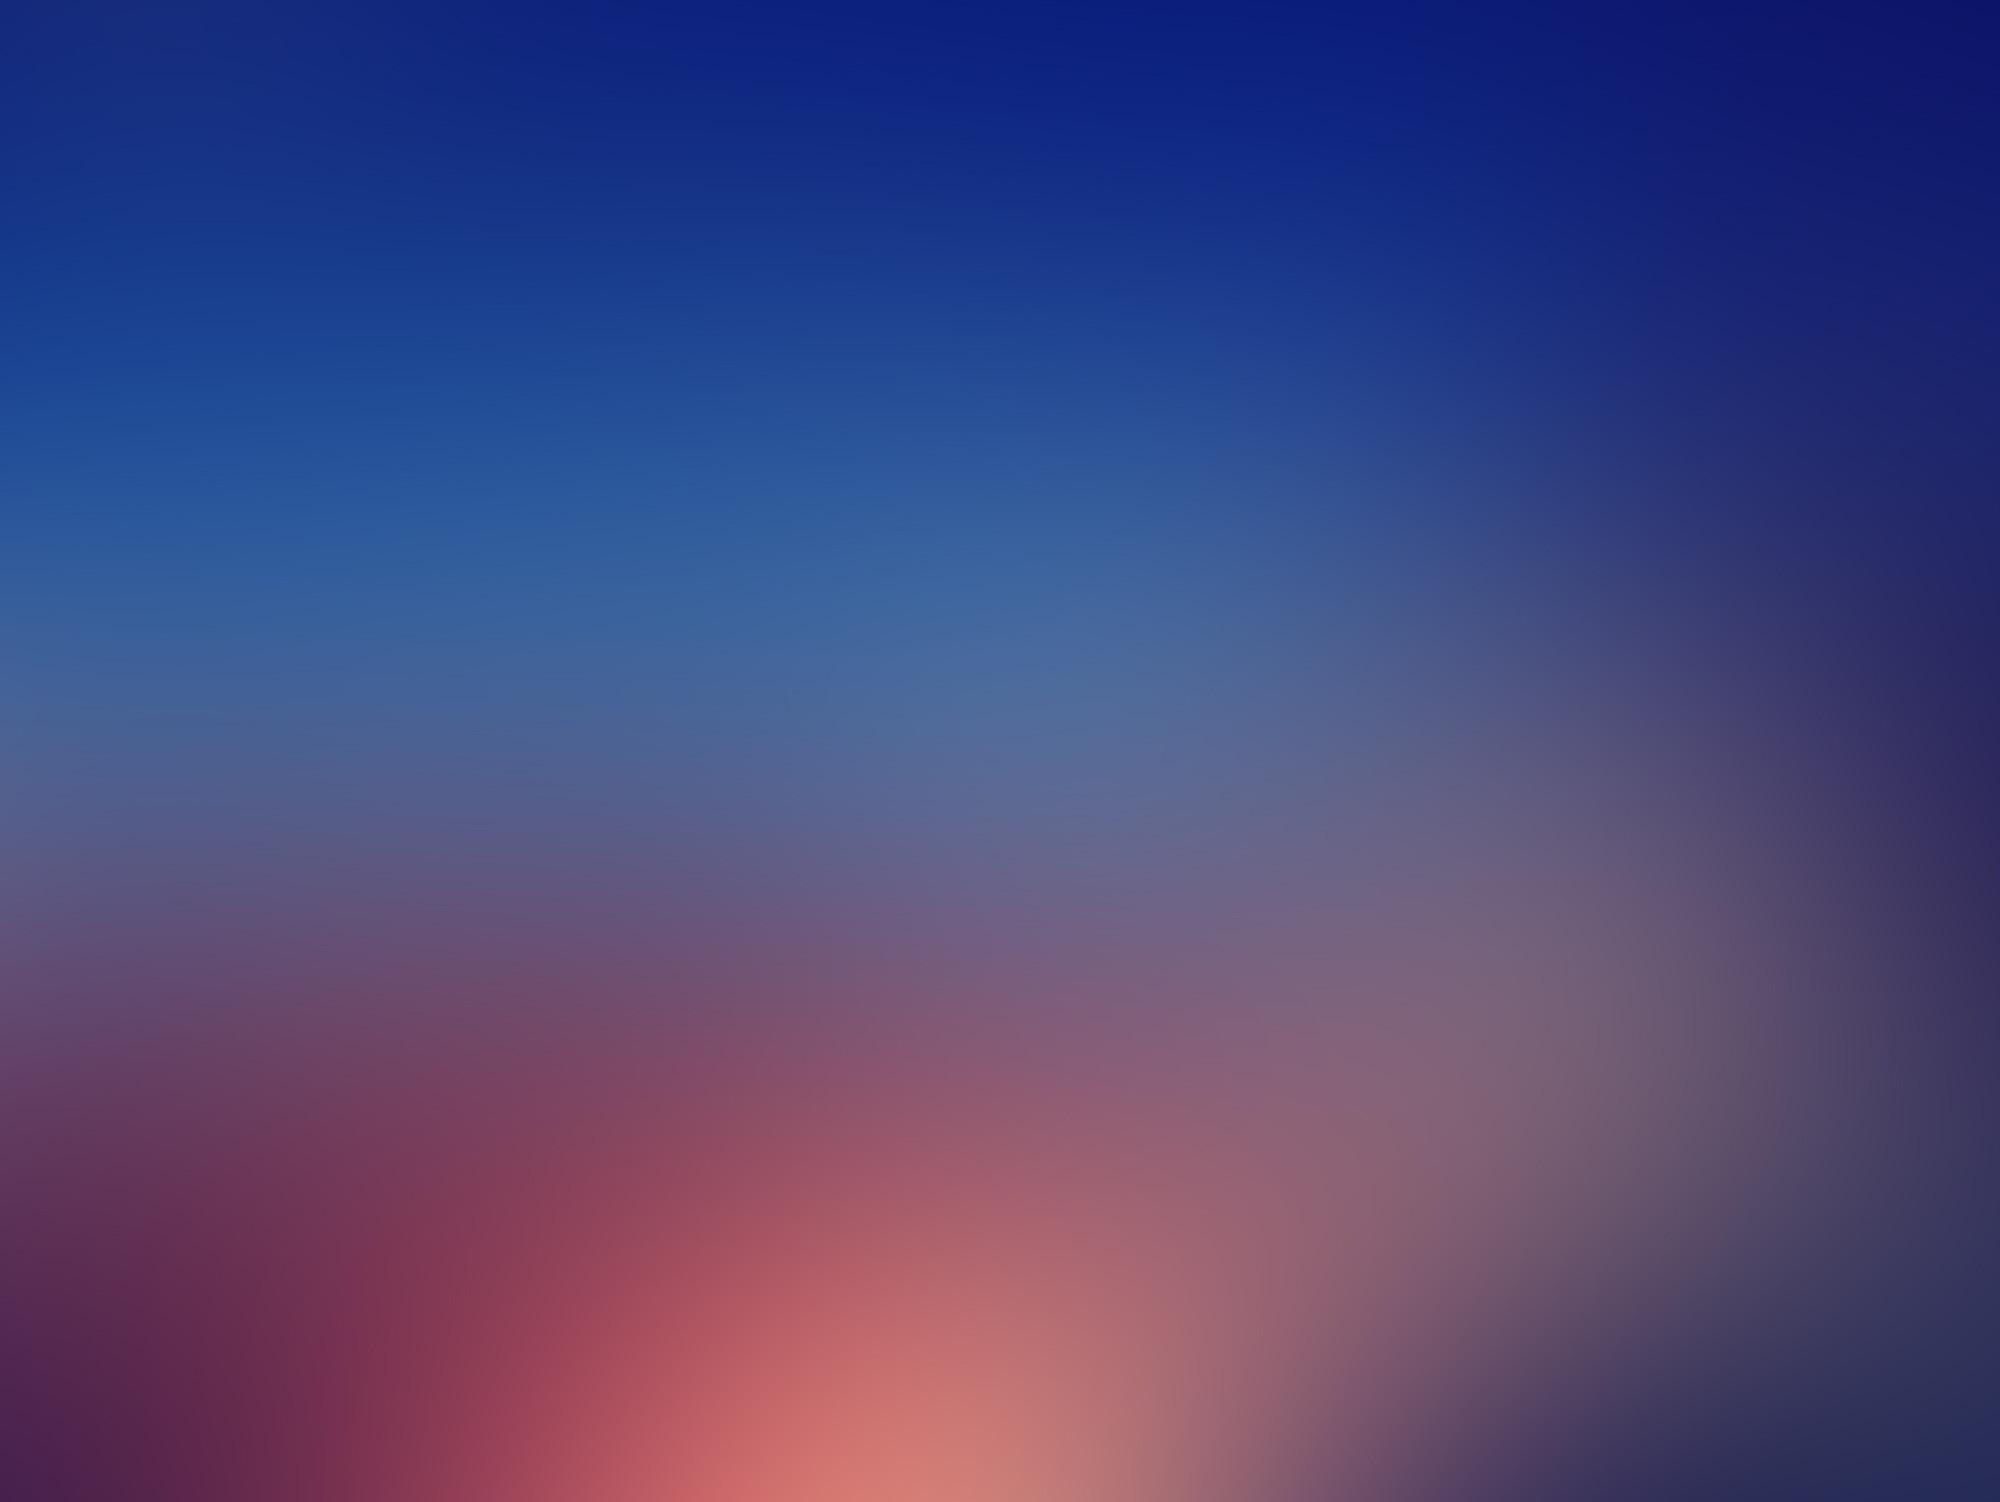 … free hd solid color wallpaper download full hd windows 10 …